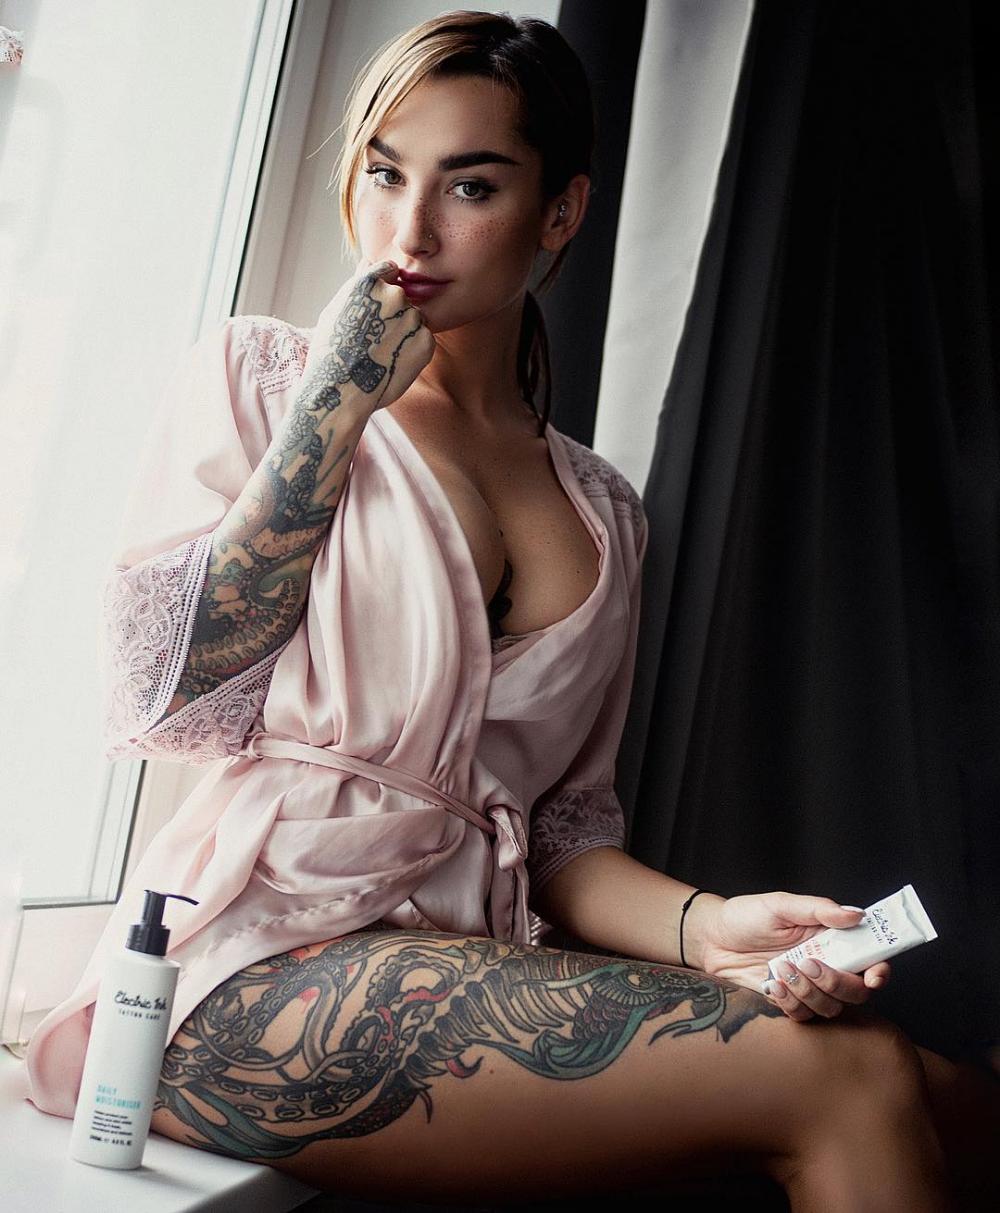 Anderson angelica Angelica @angelica_anderson_free